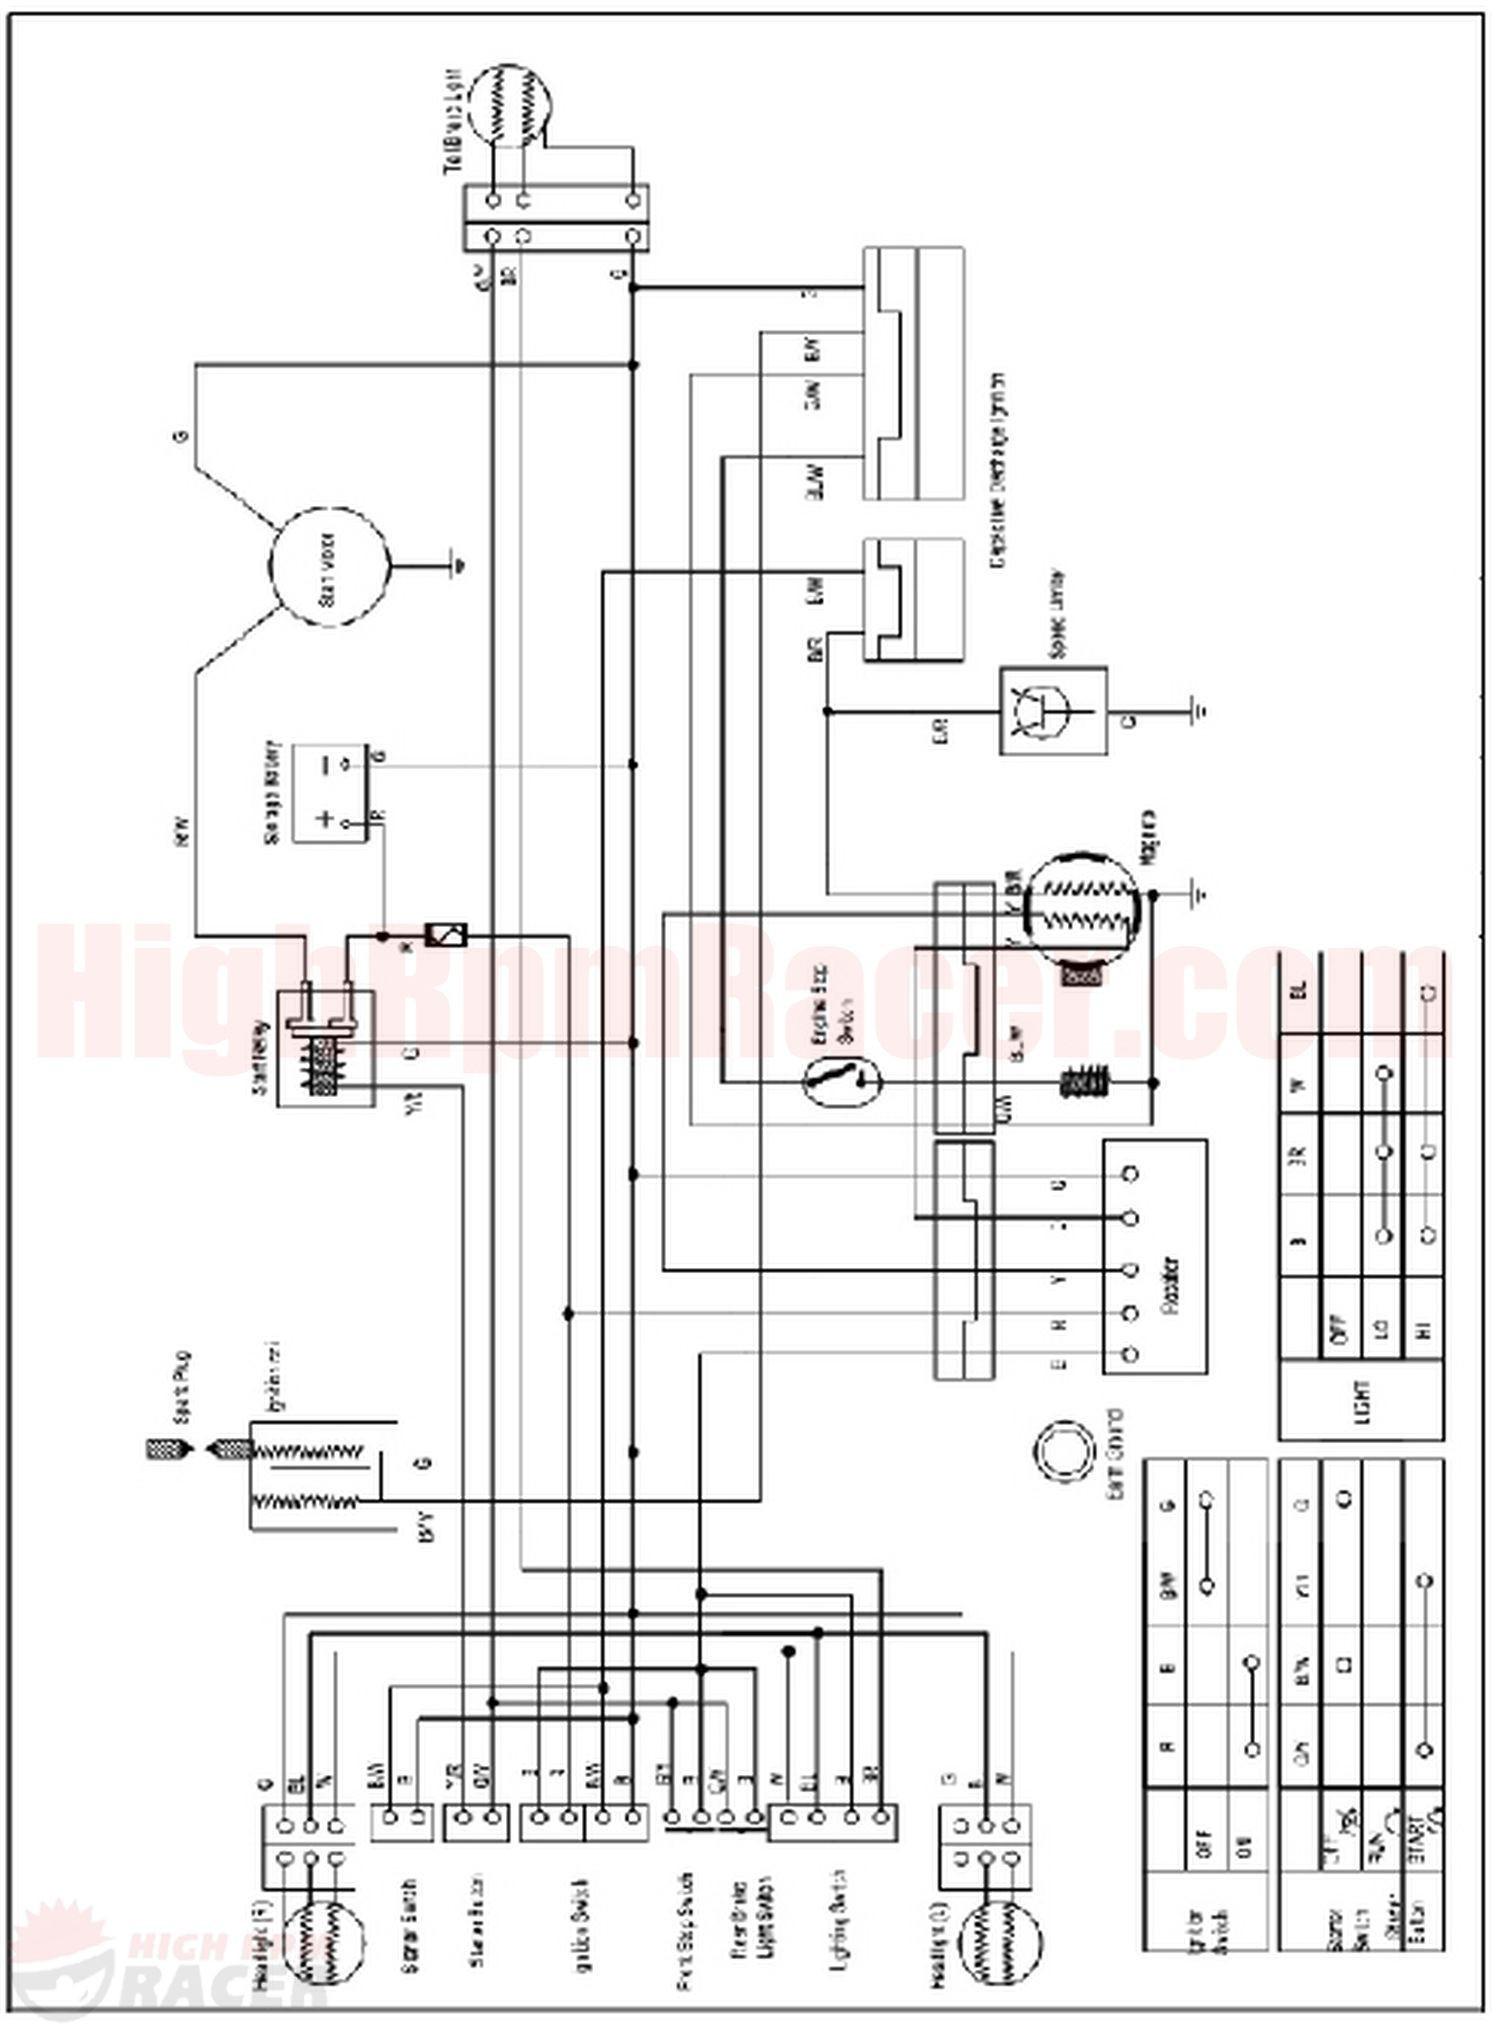 Taotao 125 atv Wiring Diagram New | Wiring Diagram Image